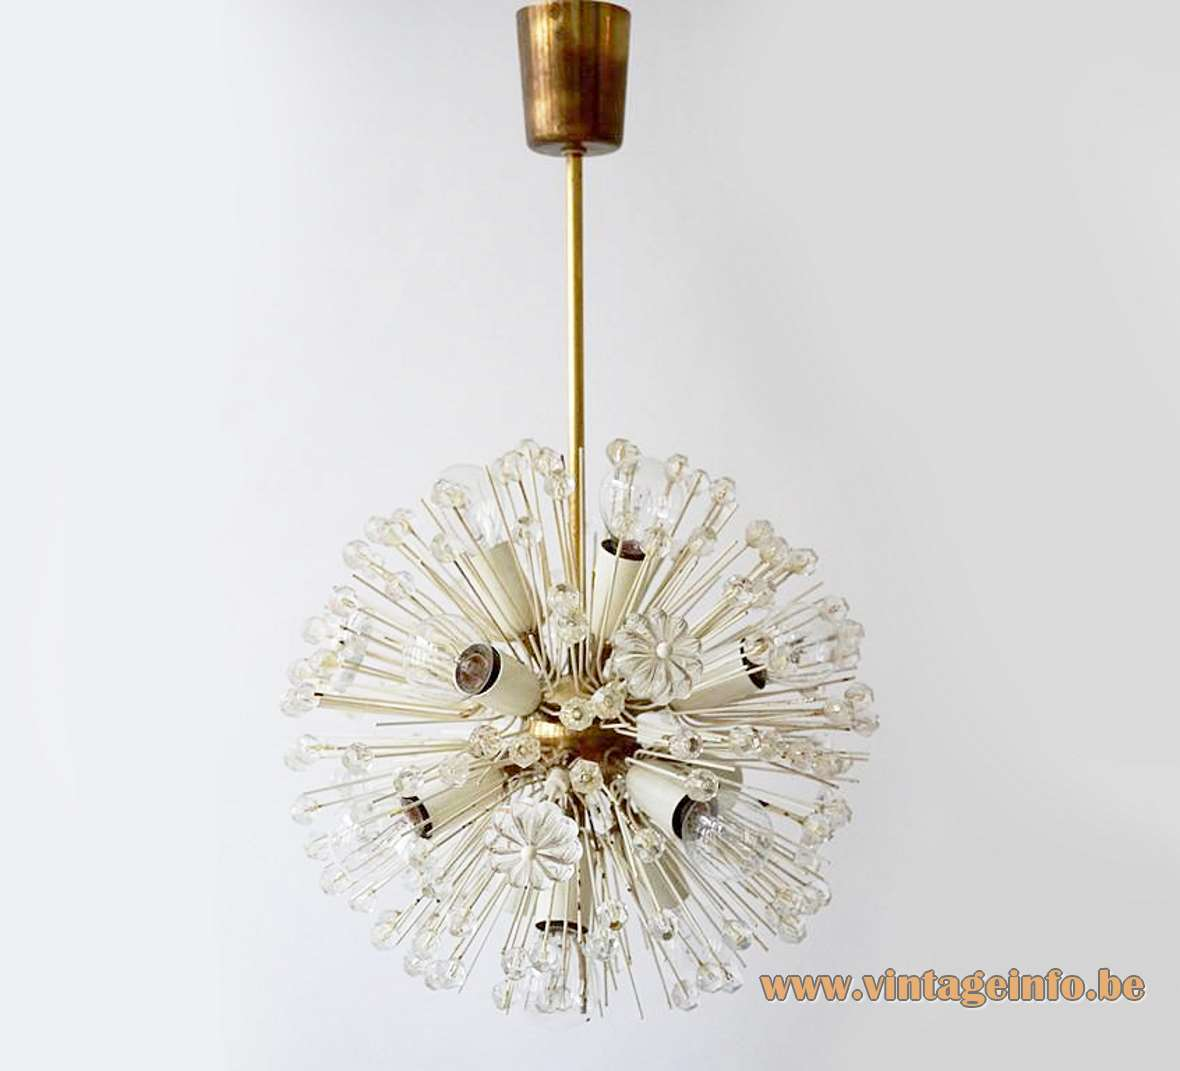 Rupert Nikoll sputnik flowers chandelier brass frame glass beads sunburst lampshade Austria 1950s 1960s Emil Stejnar